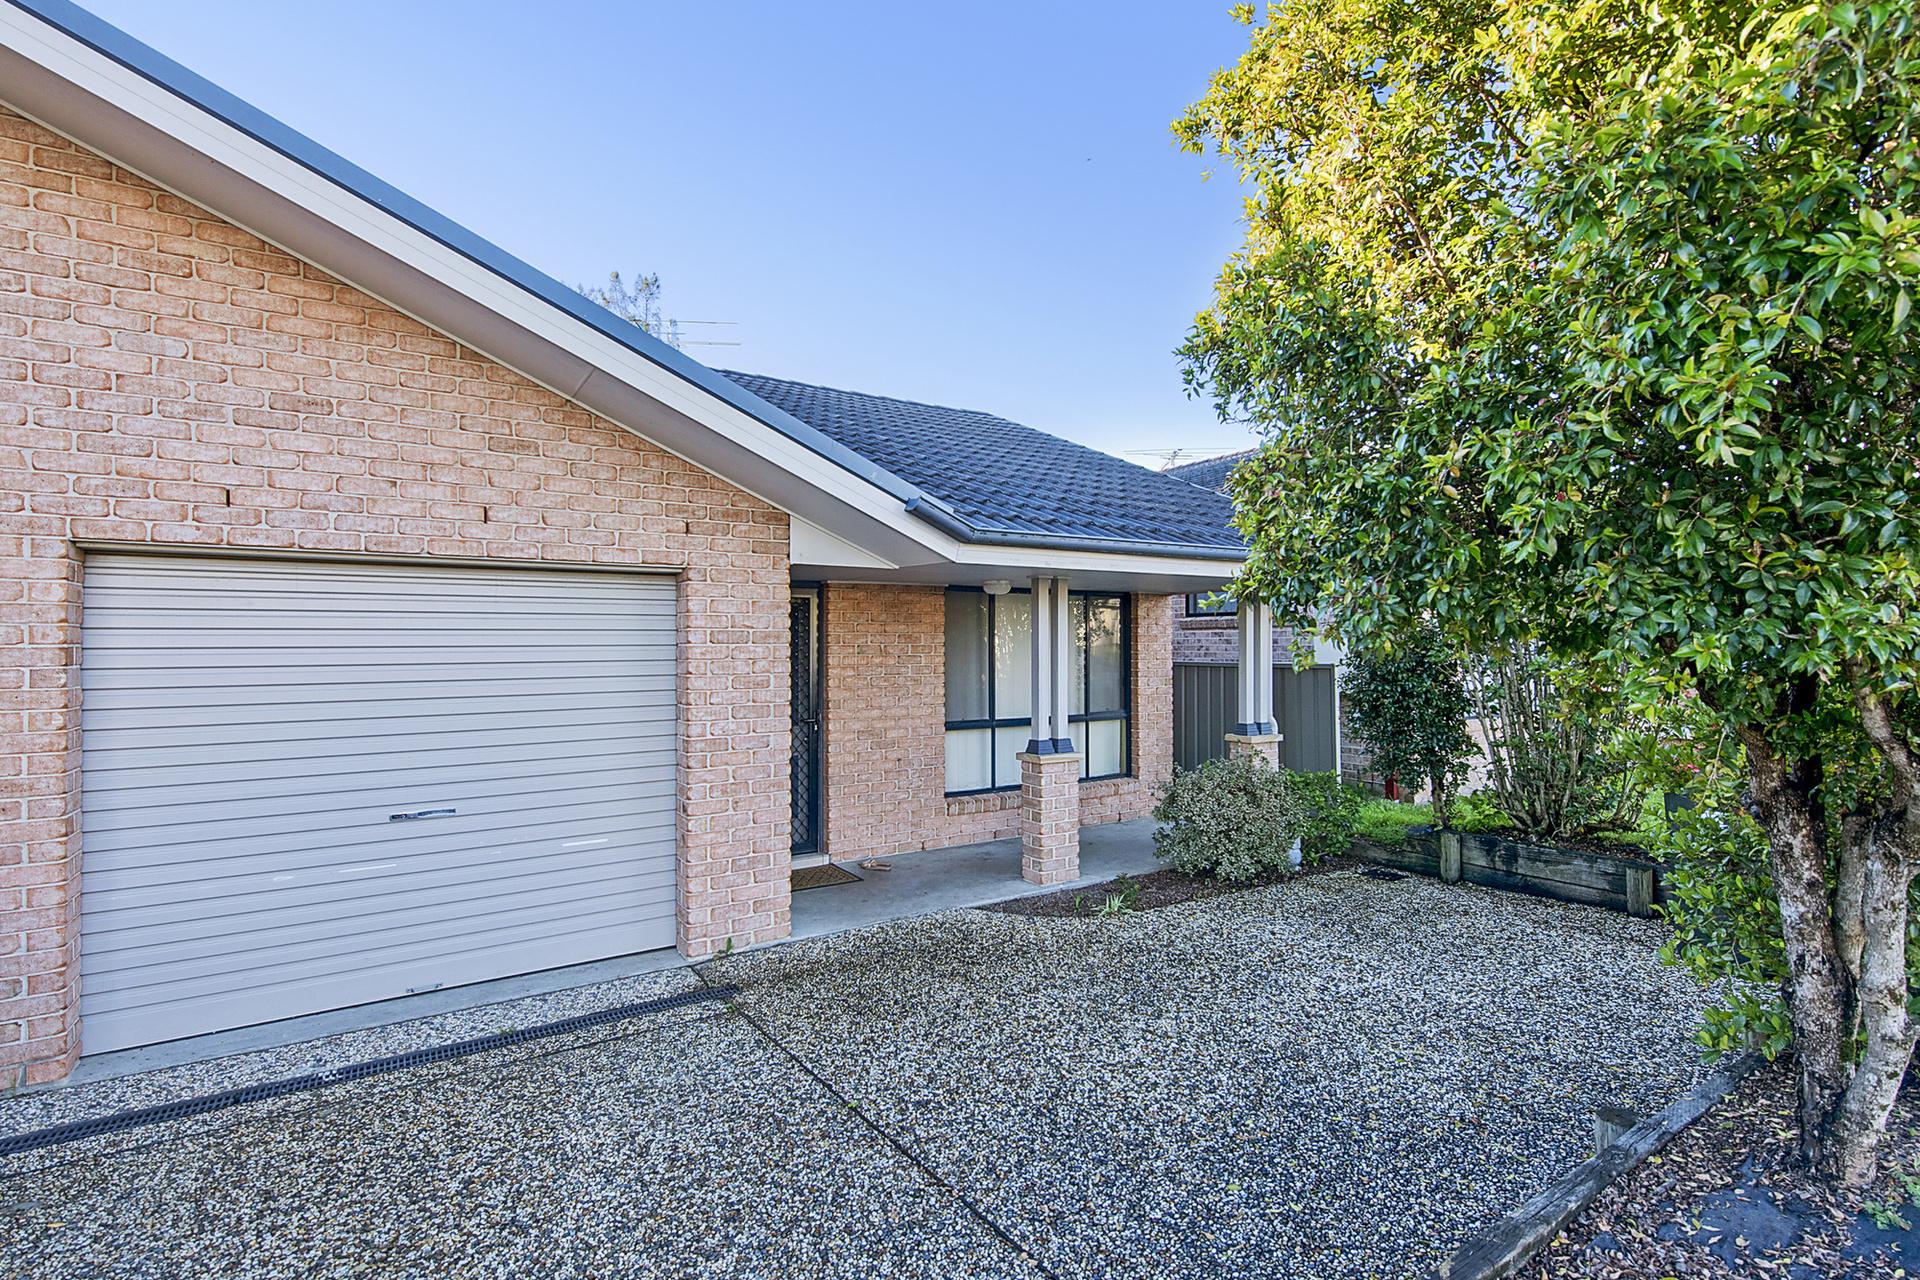 21A Cecil Baldwin Close, West Kempsey, NSW, 2440 - Image 1